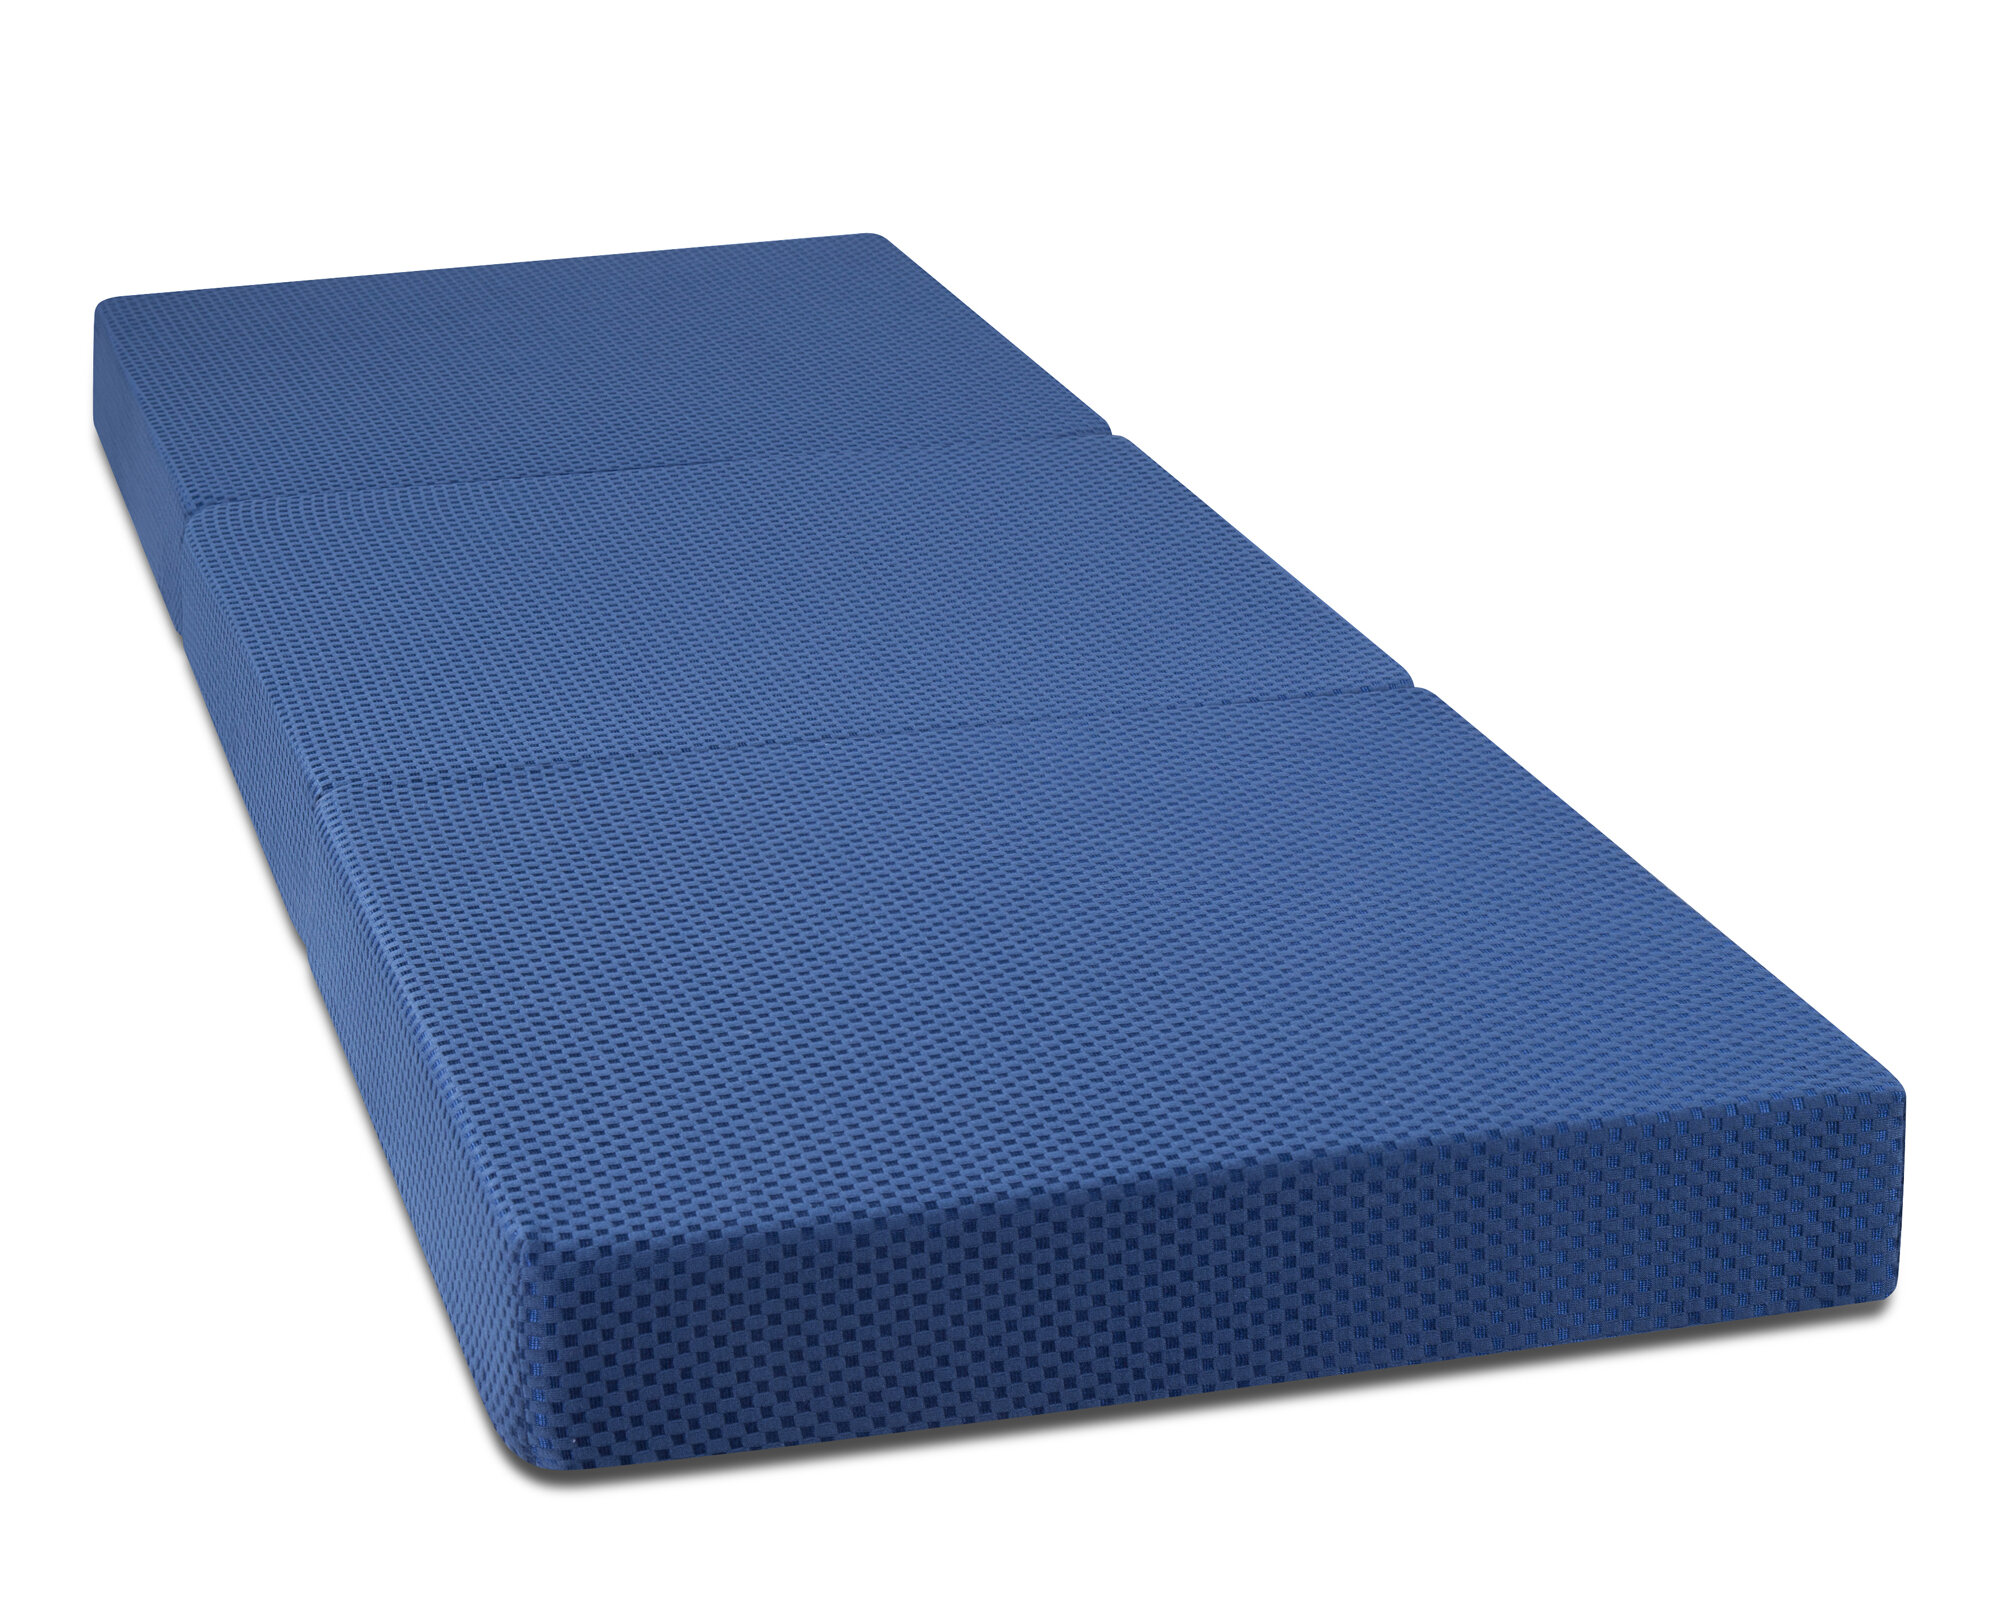 Sleeplace Tri Folding Single 4 Memory Foam Mattress Topper Reviews Wayfair